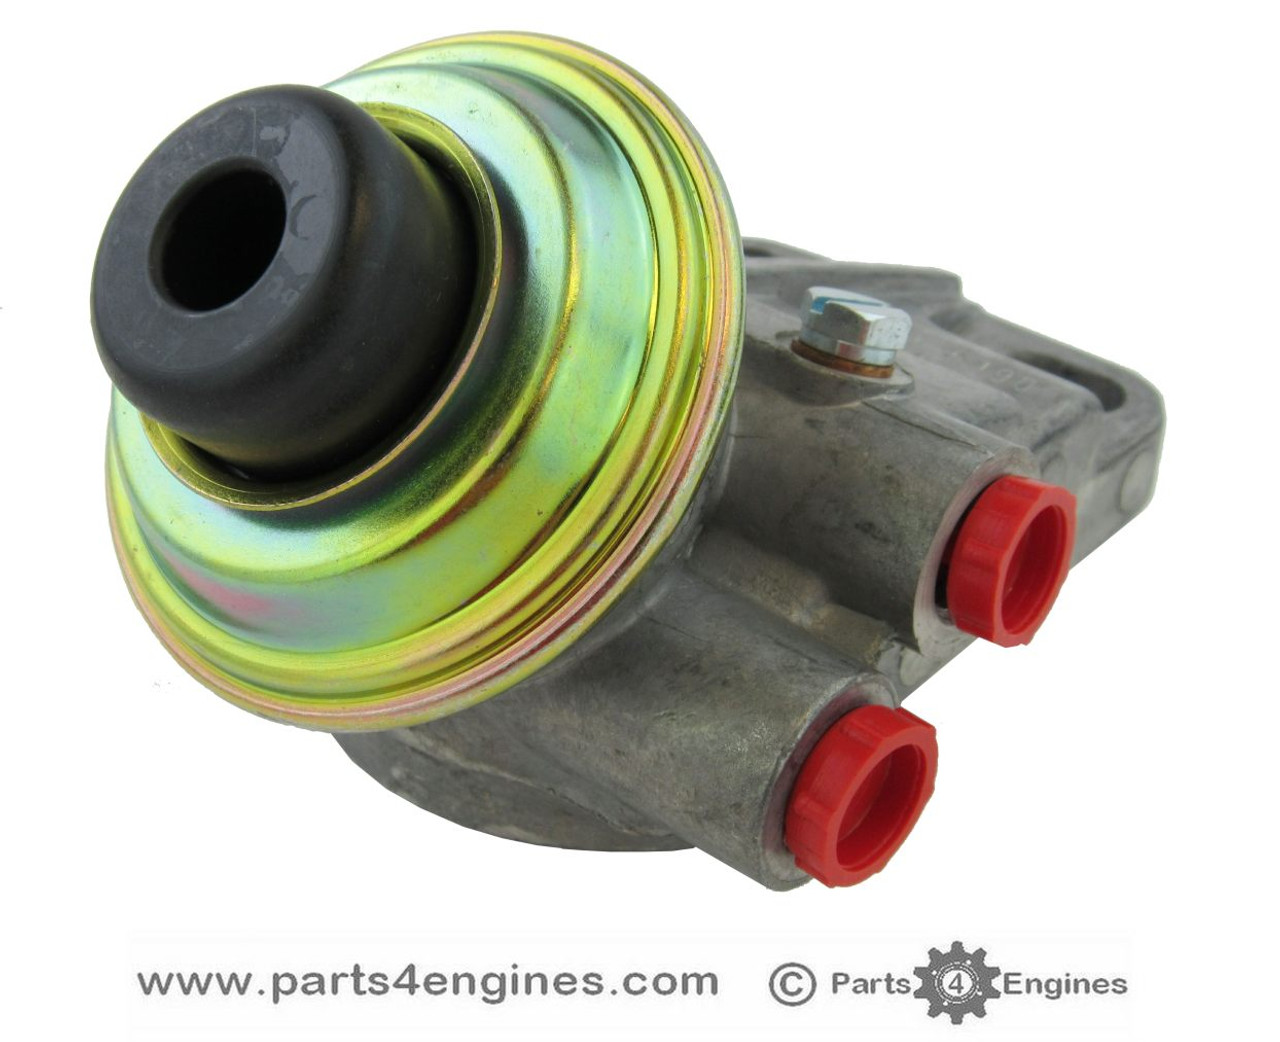 Volvo Penta D2-60F Fuel filter head, from parts4engines.com